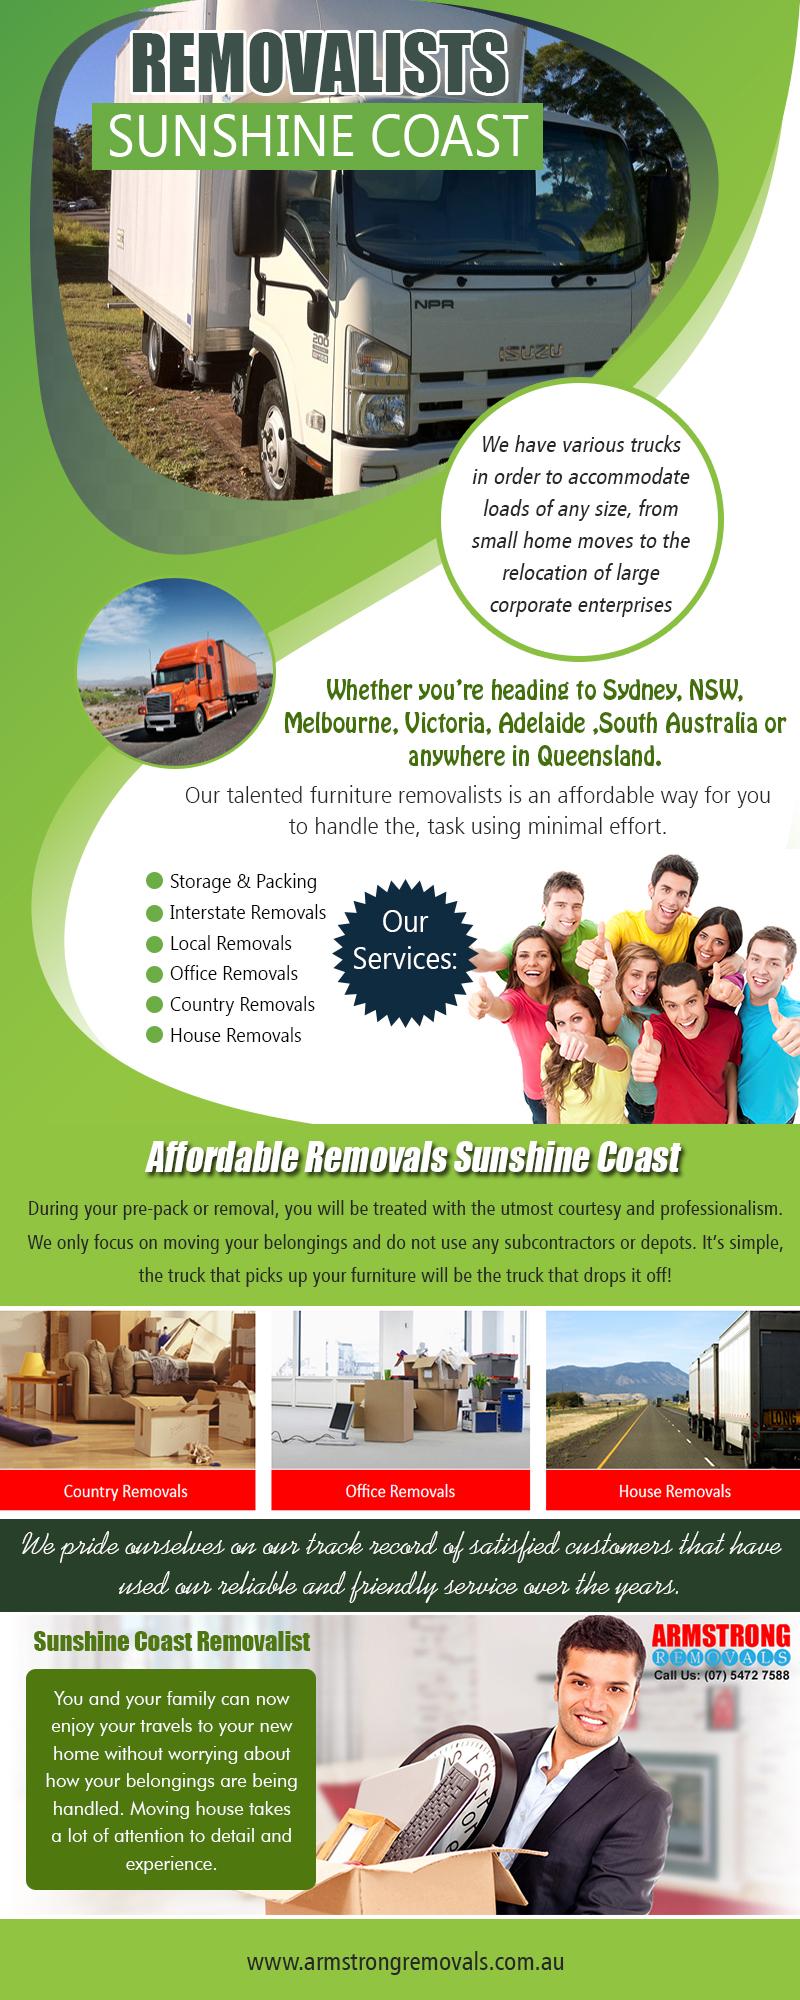 Sunshine coast removalist | armstrongremovals.com.au